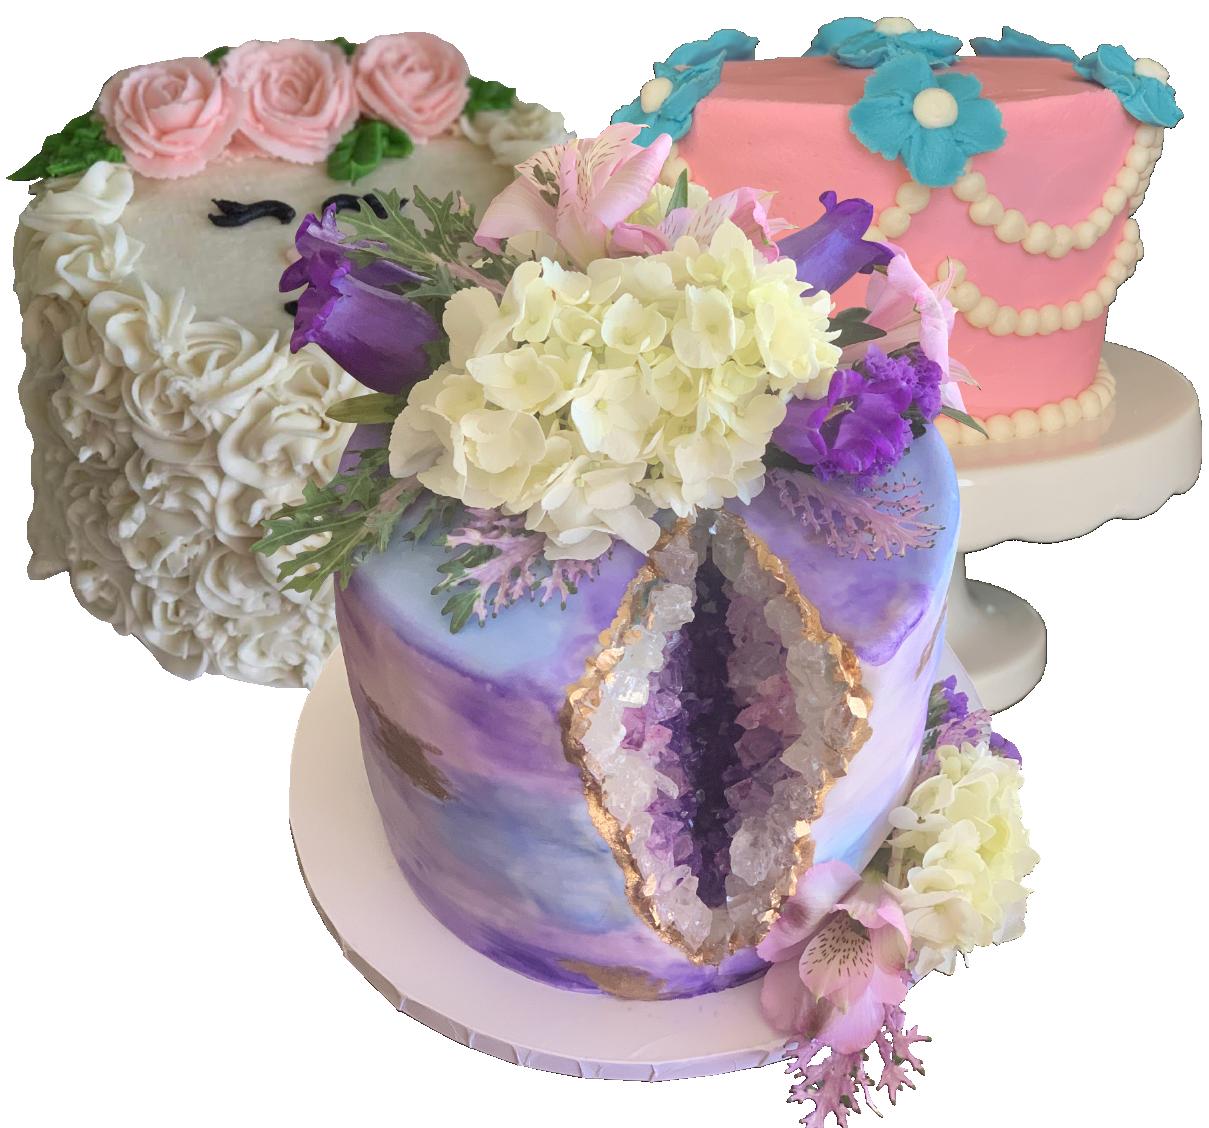 Charli Ann's Heavenly Cakes